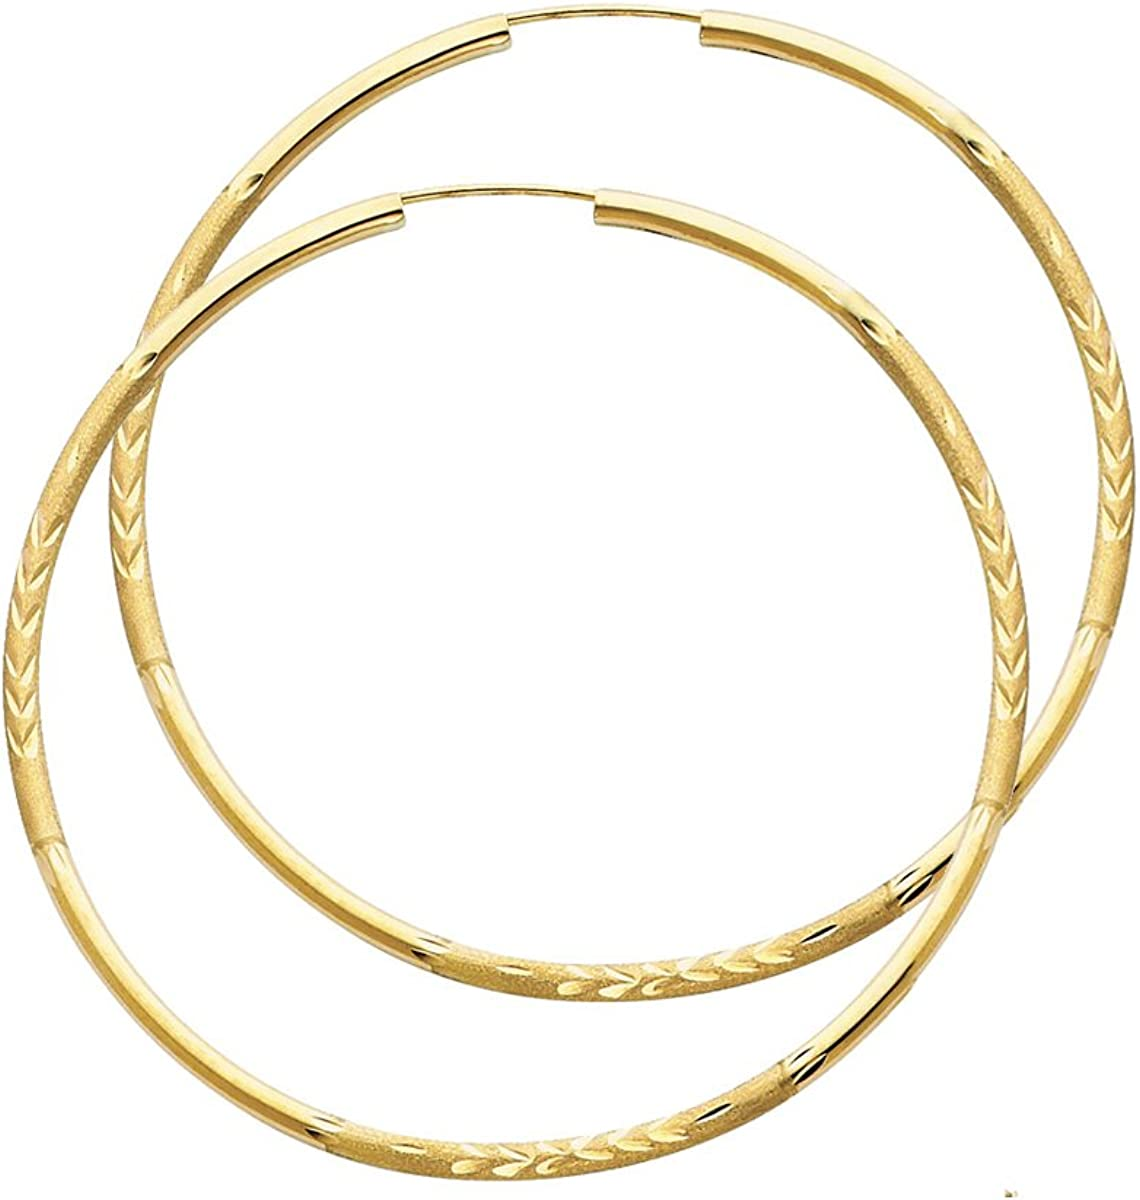 14k Yellow Gold 2mm Thickness Endless Diamond Cut Hoop Earrings - Diameter 50mm